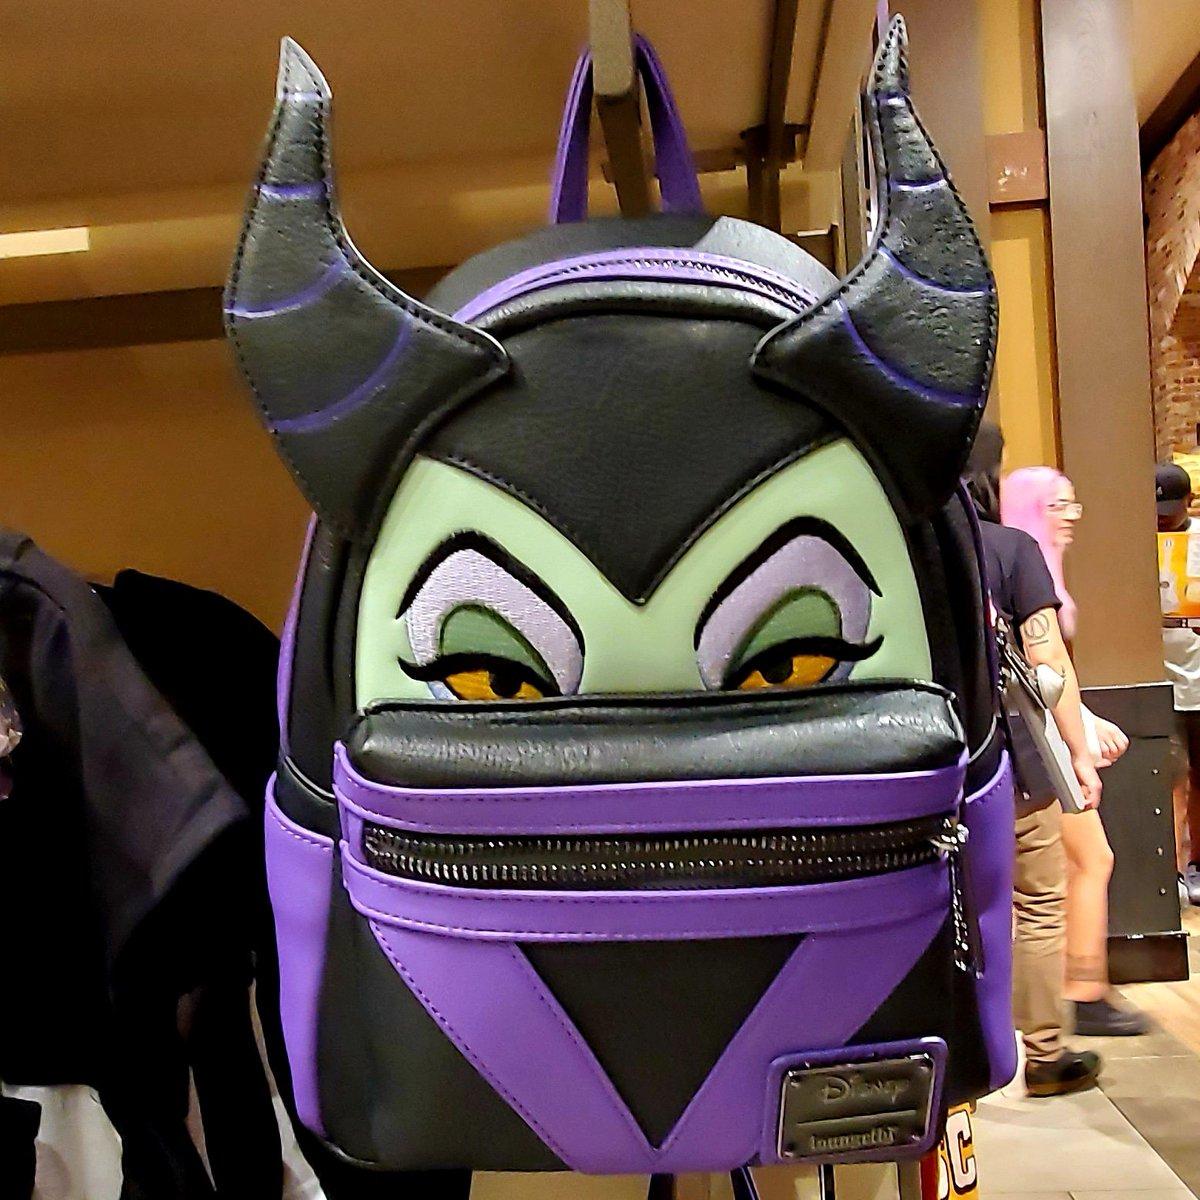 Sasaki Time On Twitter Disneylandtoday This Maleficent